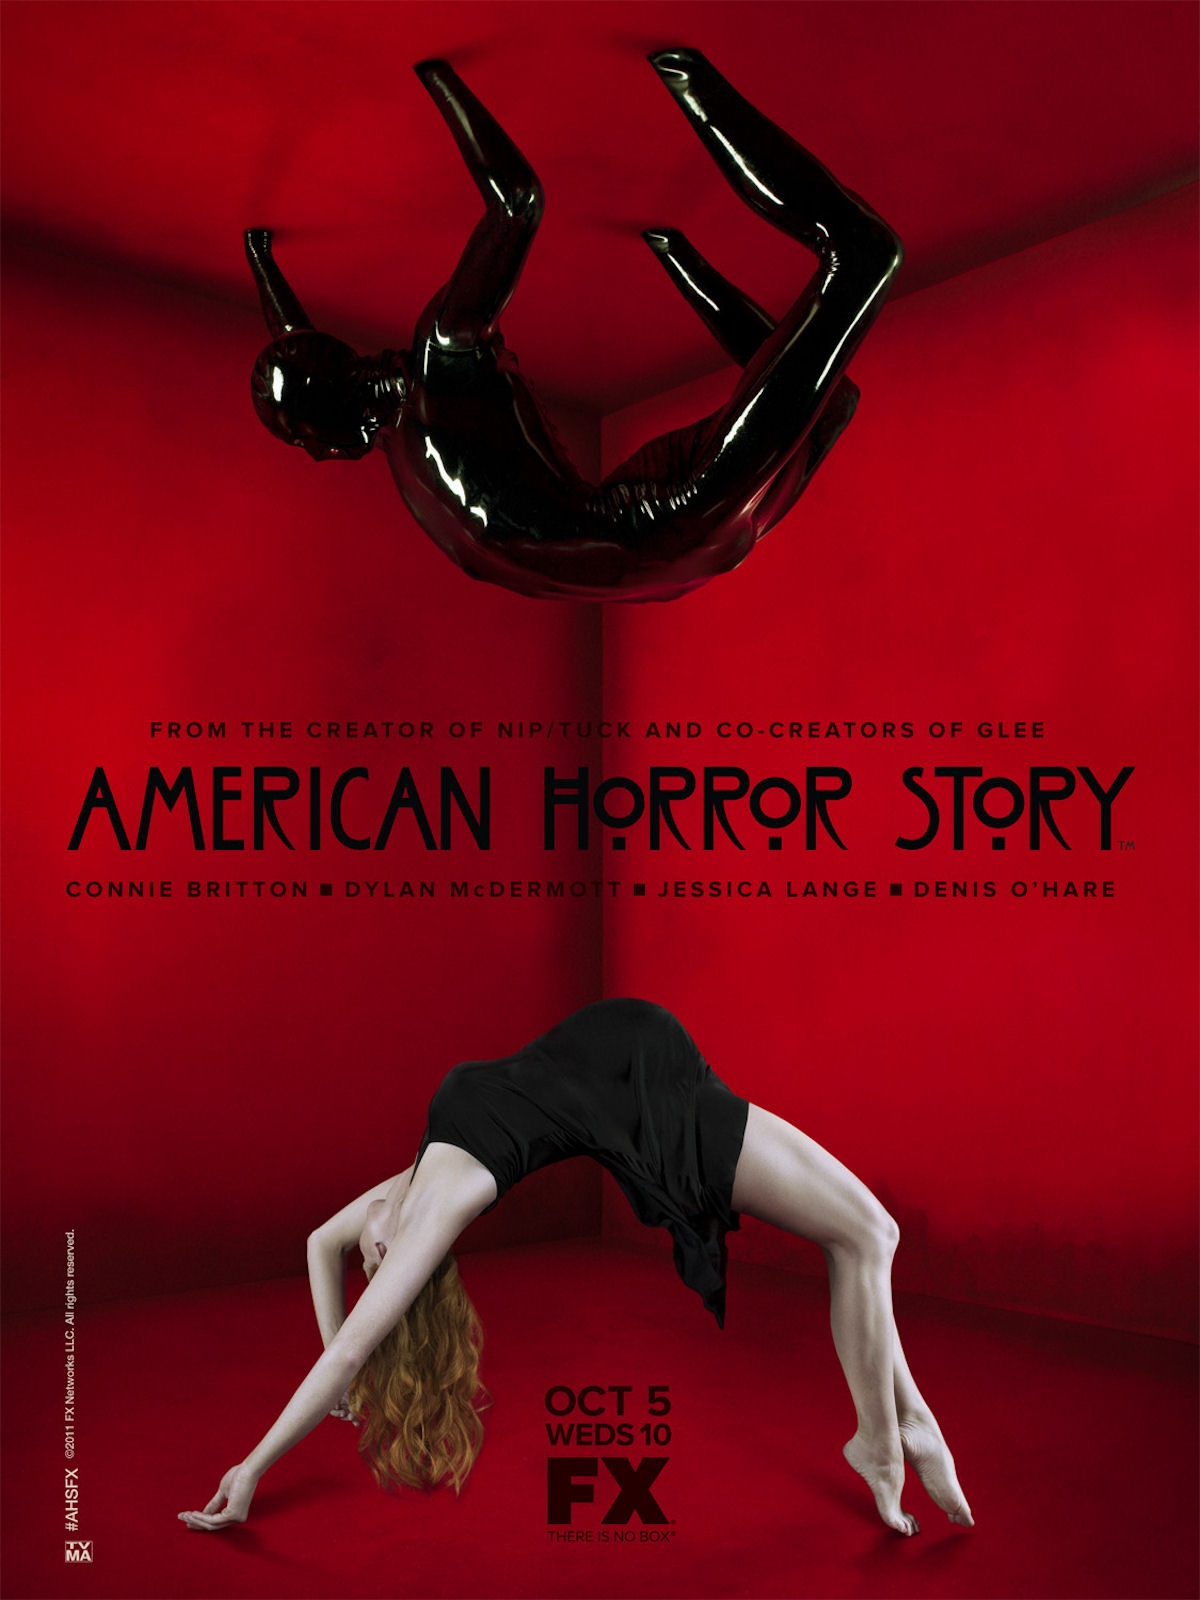 http://4.bp.blogspot.com/-Pwv1Zg7666Y/Tq804EYTFXI/AAAAAAAAWLQ/_x8JFw3RS54/s1600/american-horror-story-poster-825.jpg